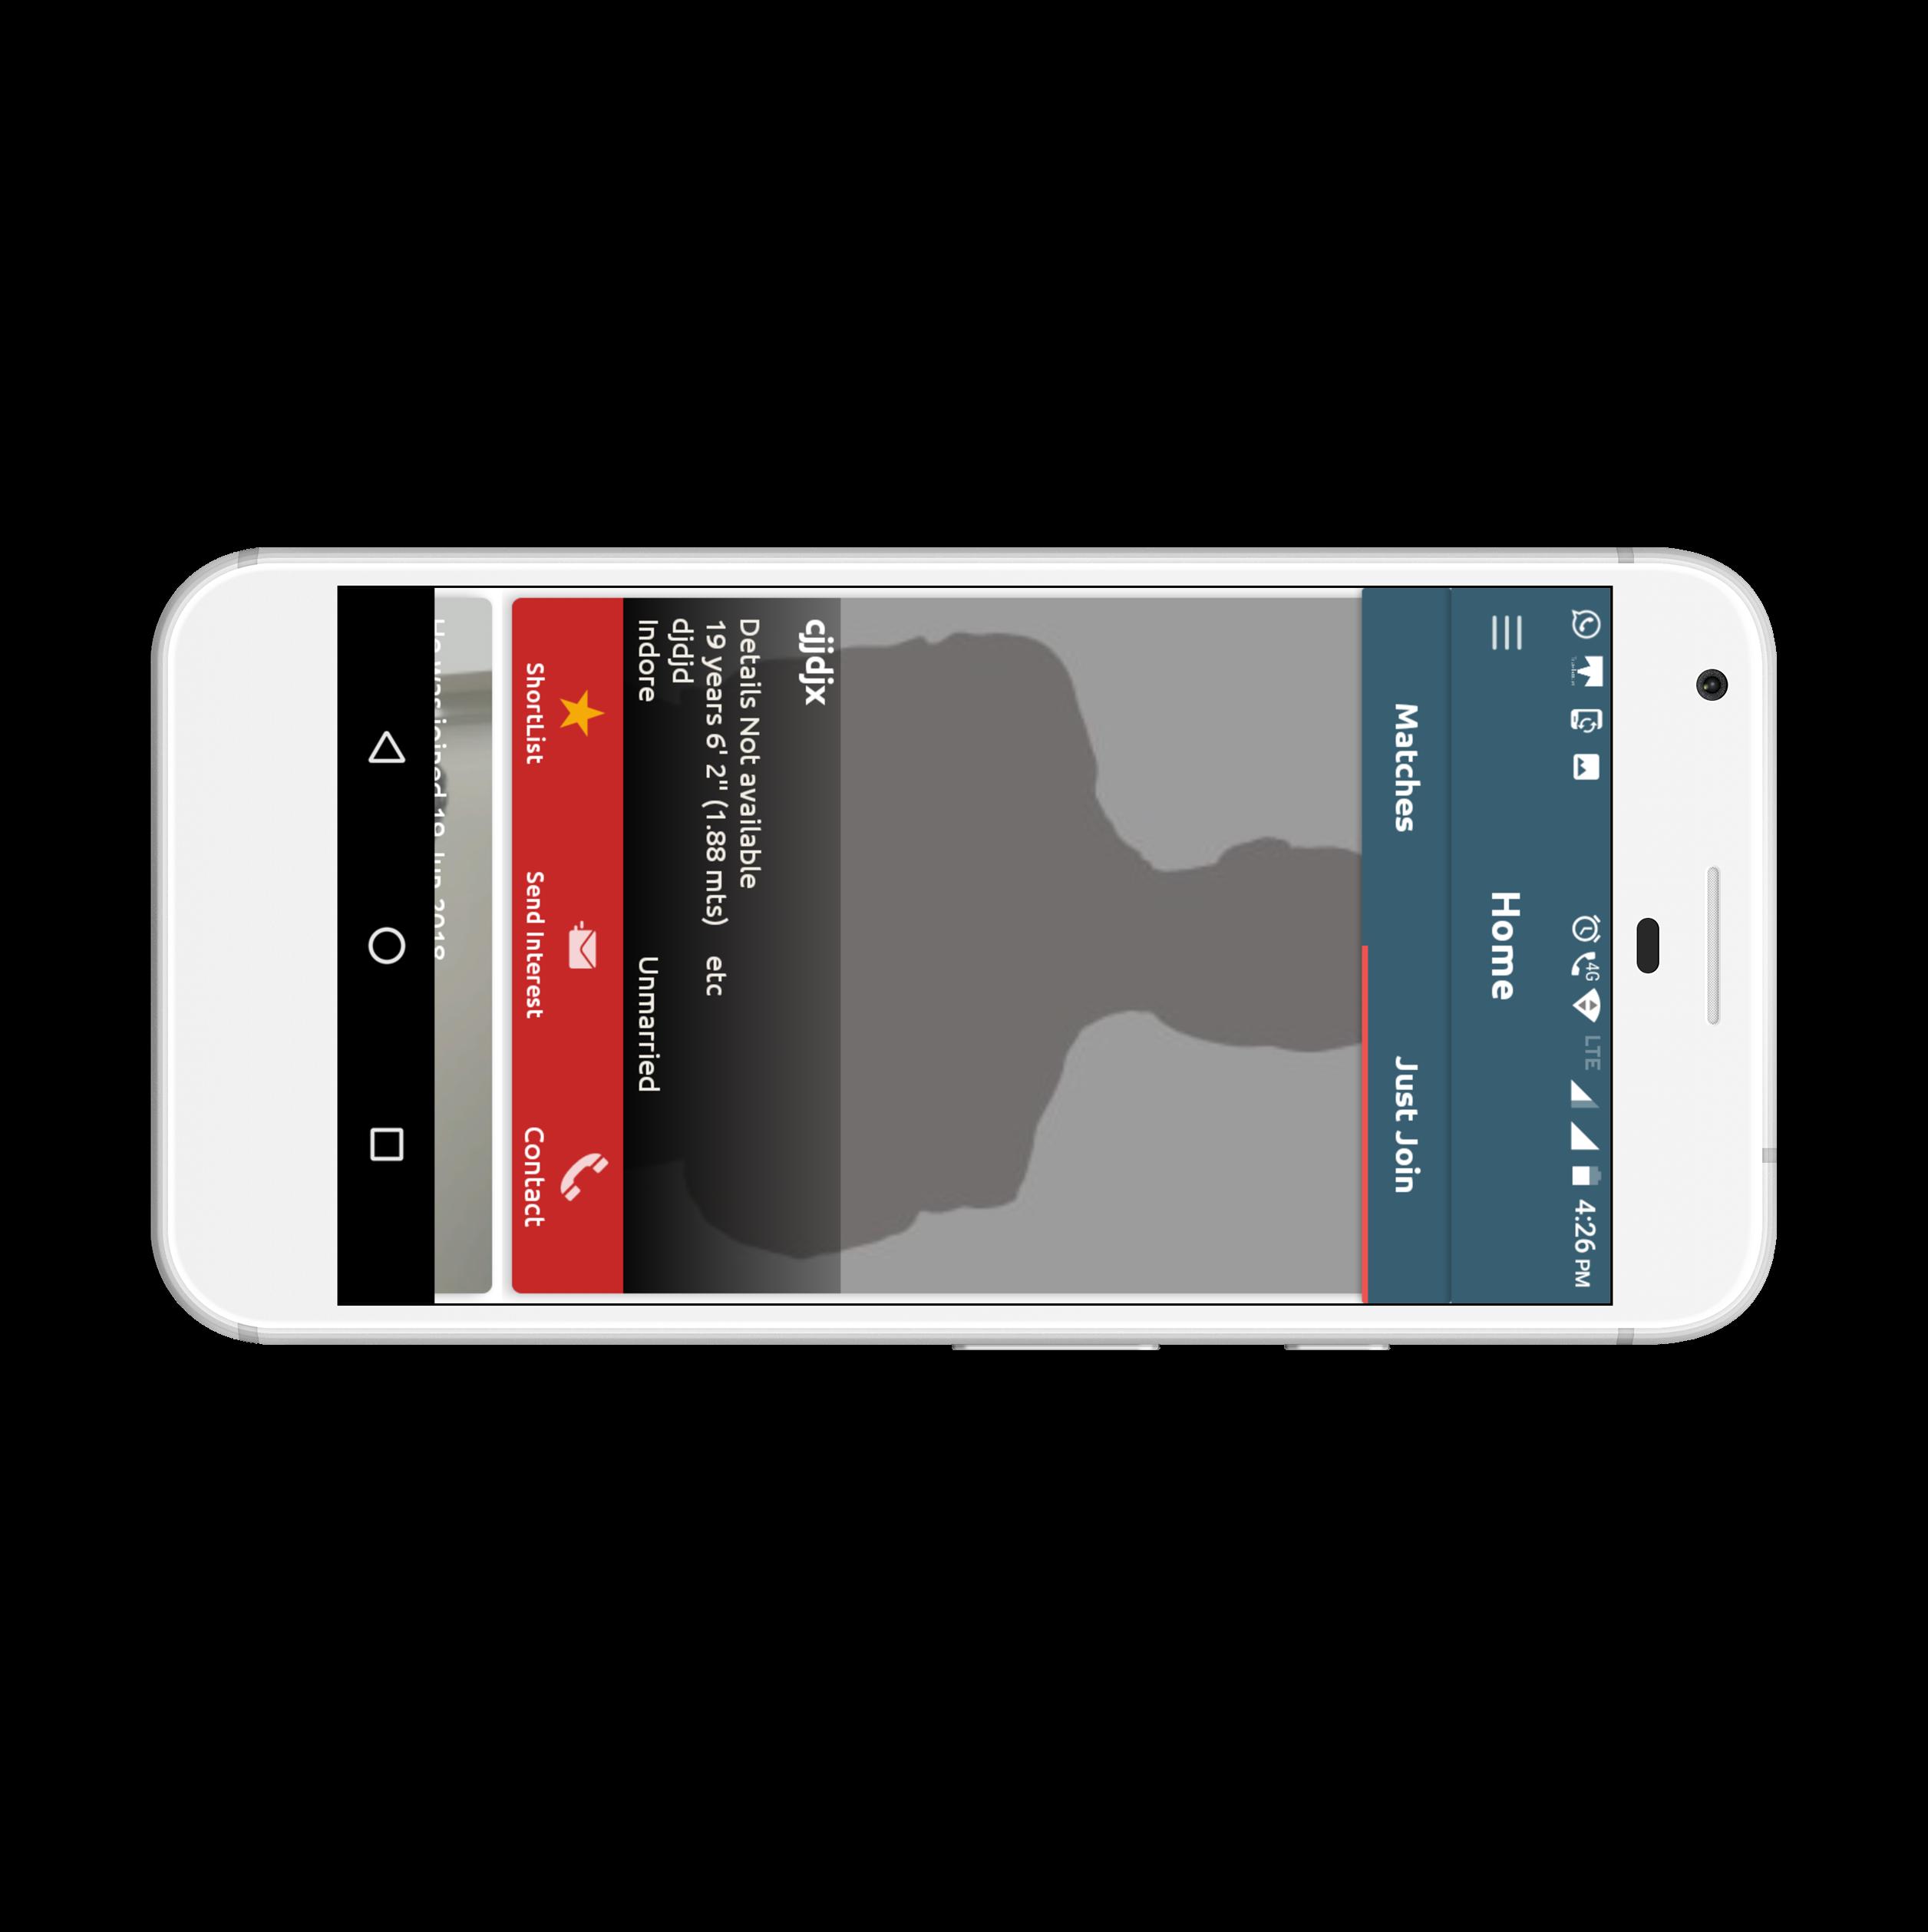 Matrimonial - Wedding app by samyotech | CodeCanyon